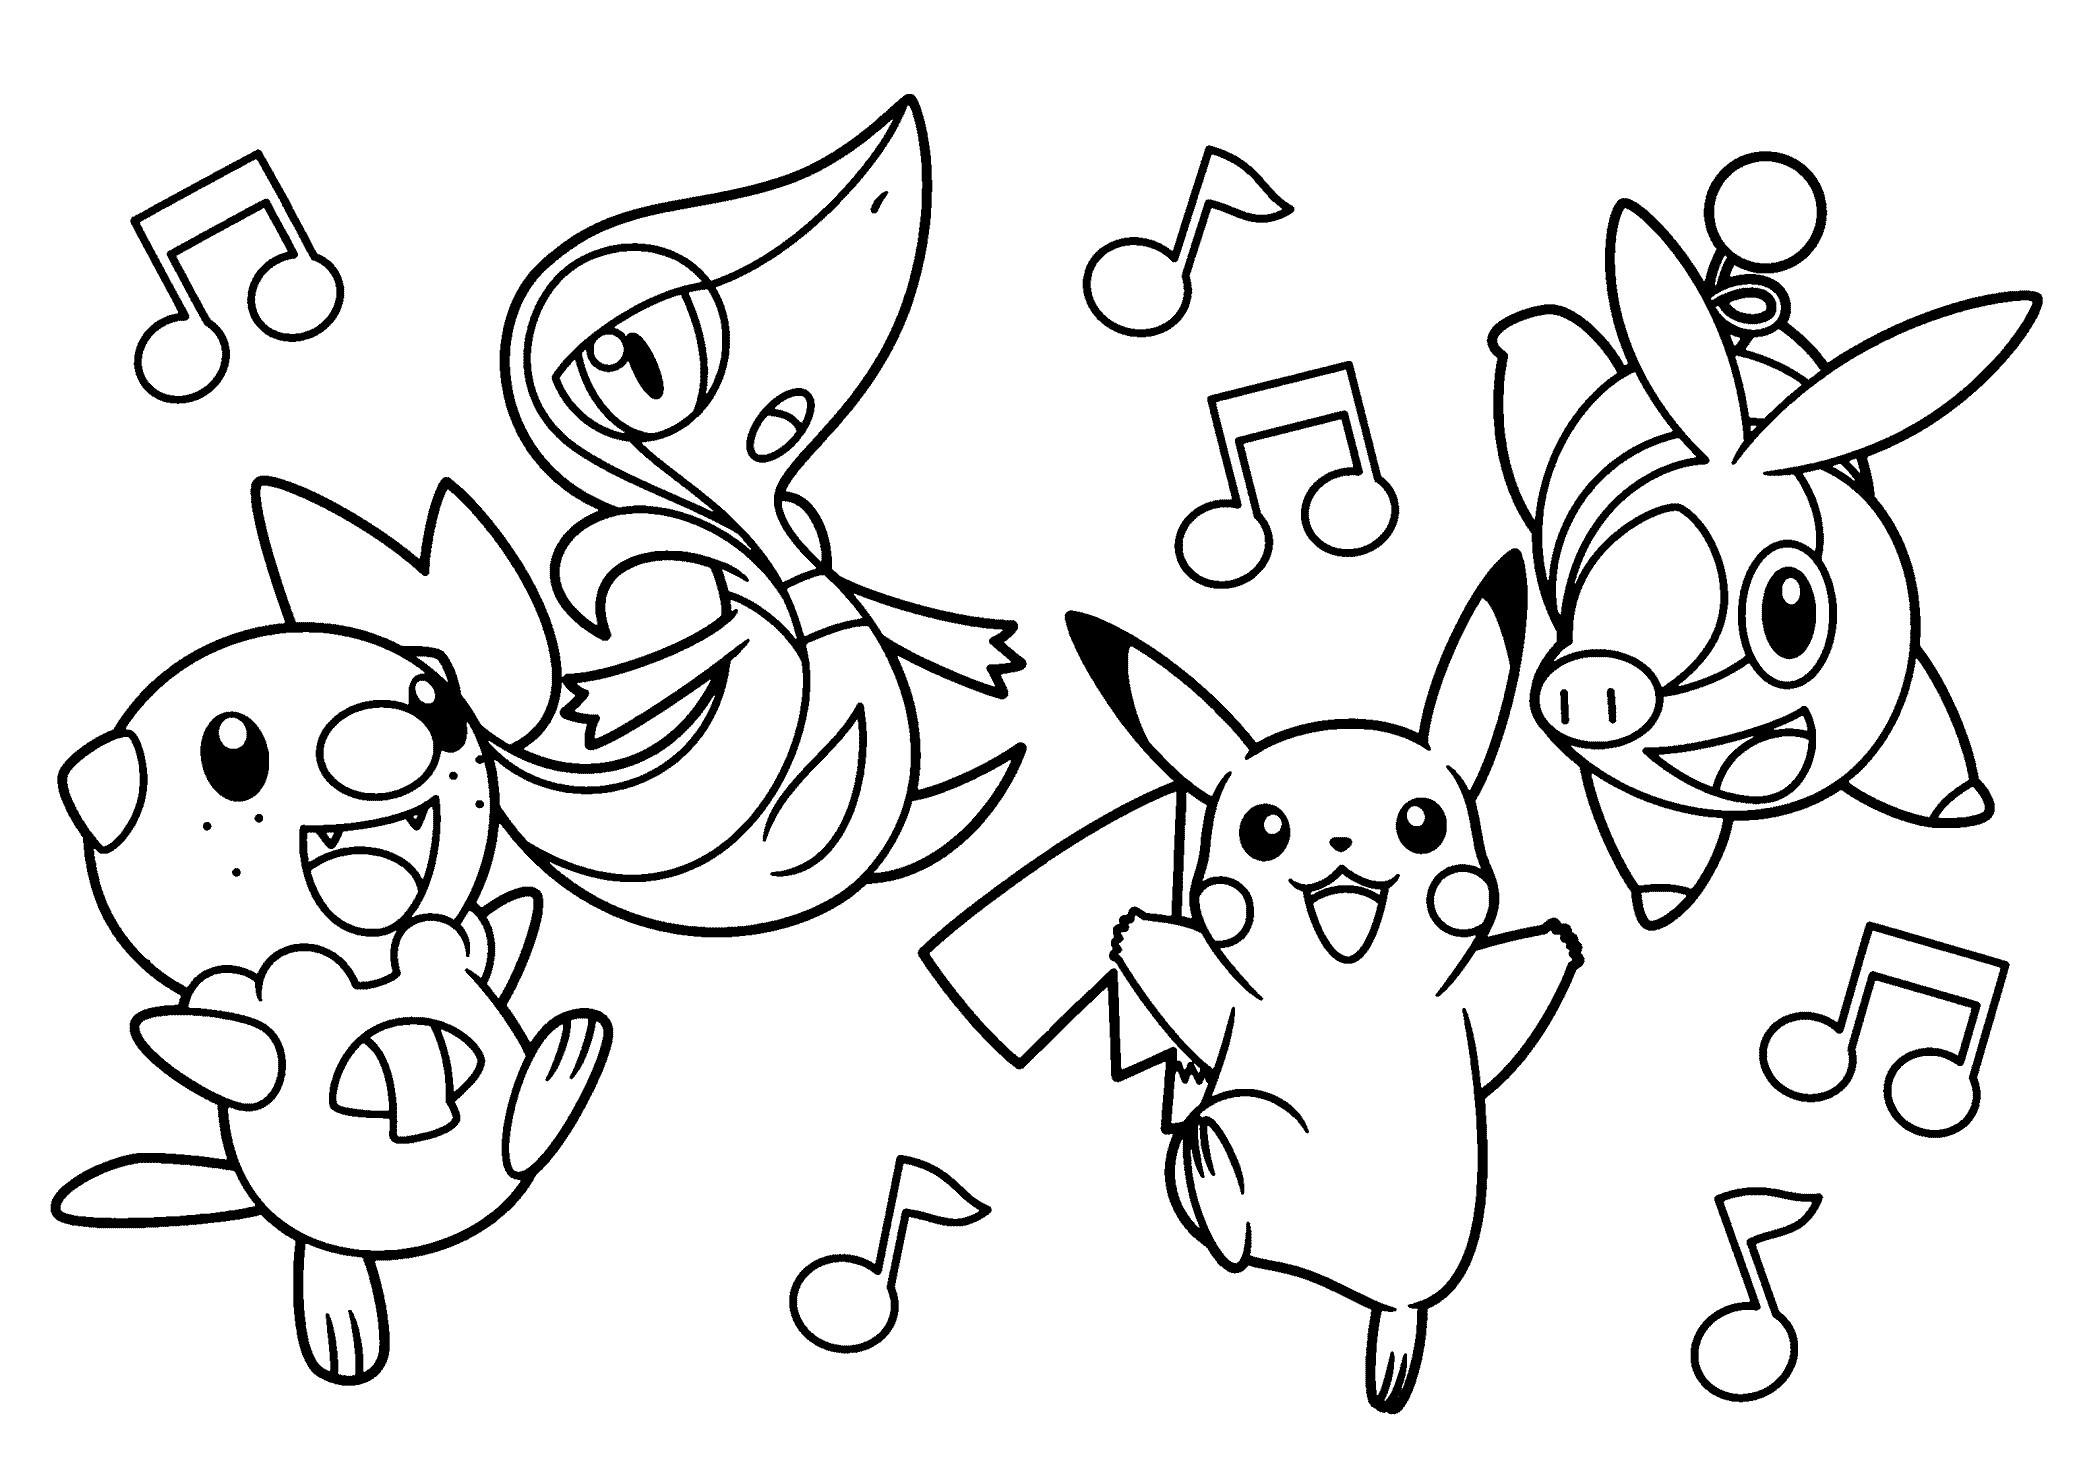 2079x1483 Pokemon Coloring Pages Braviary Best Of Malarbilder Pokemon Att